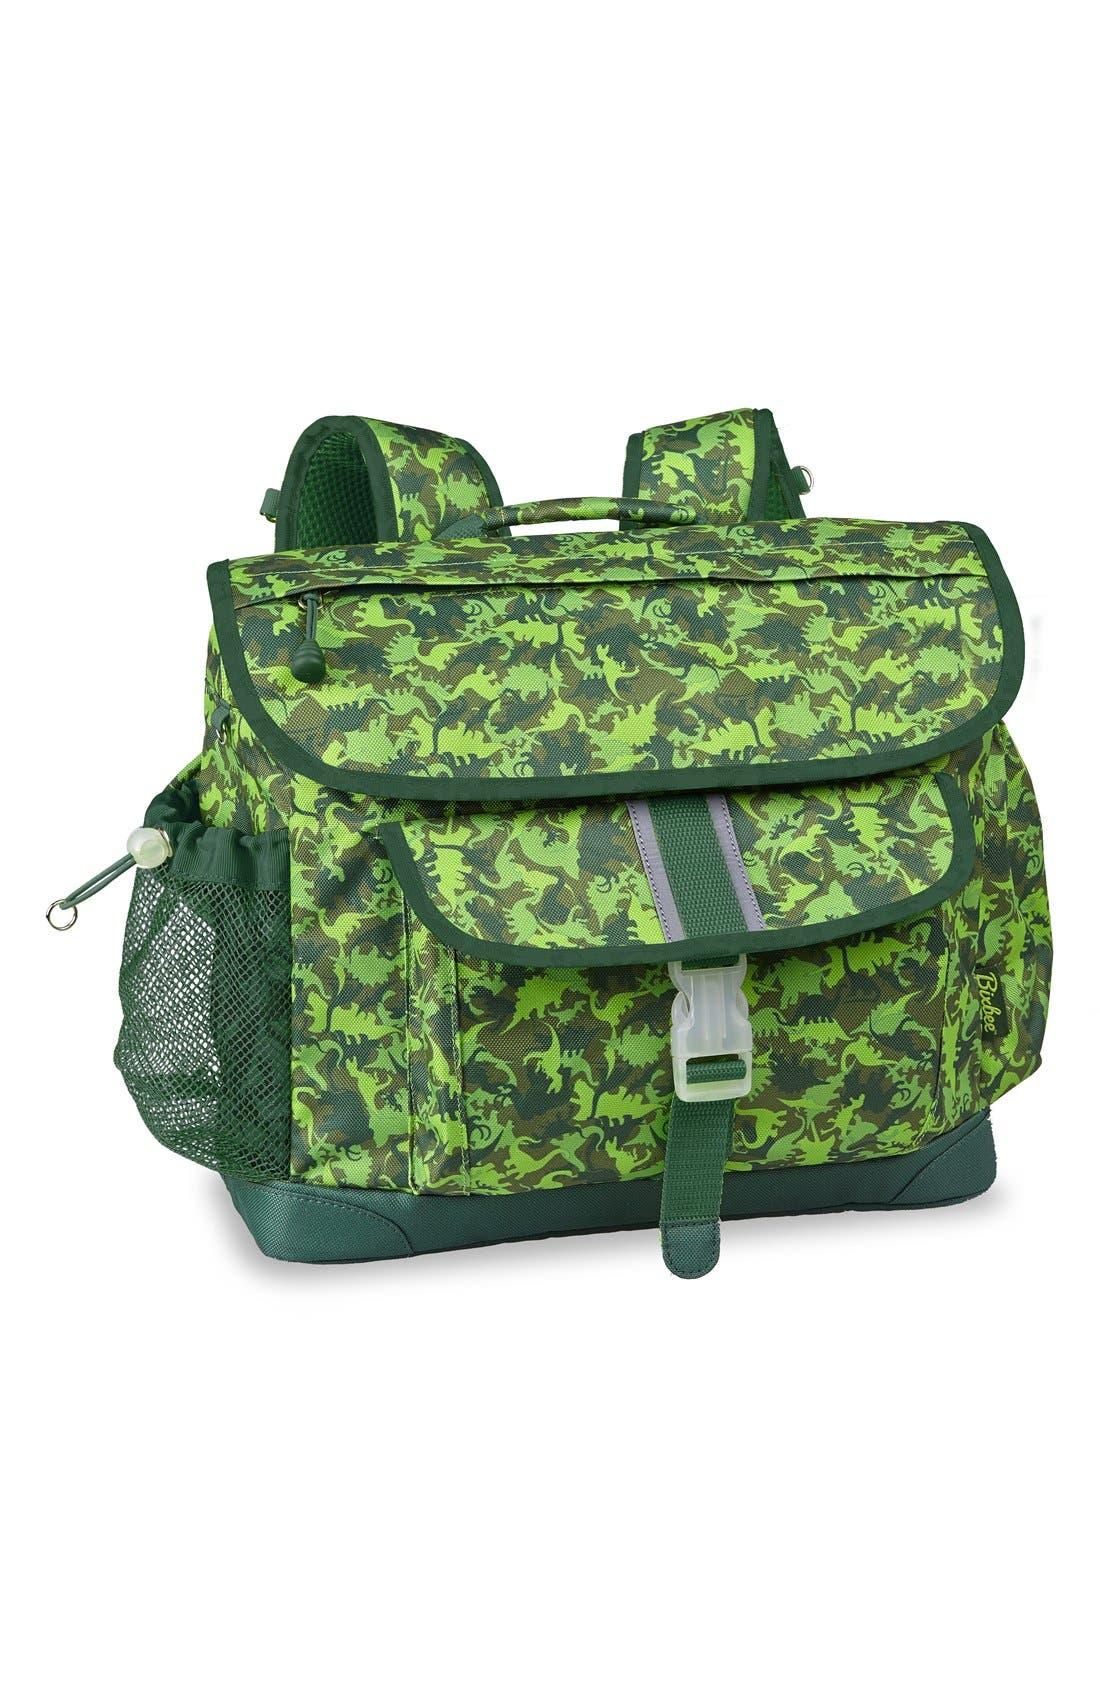 Bixbee 'Large Dino Camo' Water Resistant Backpack (Kids)